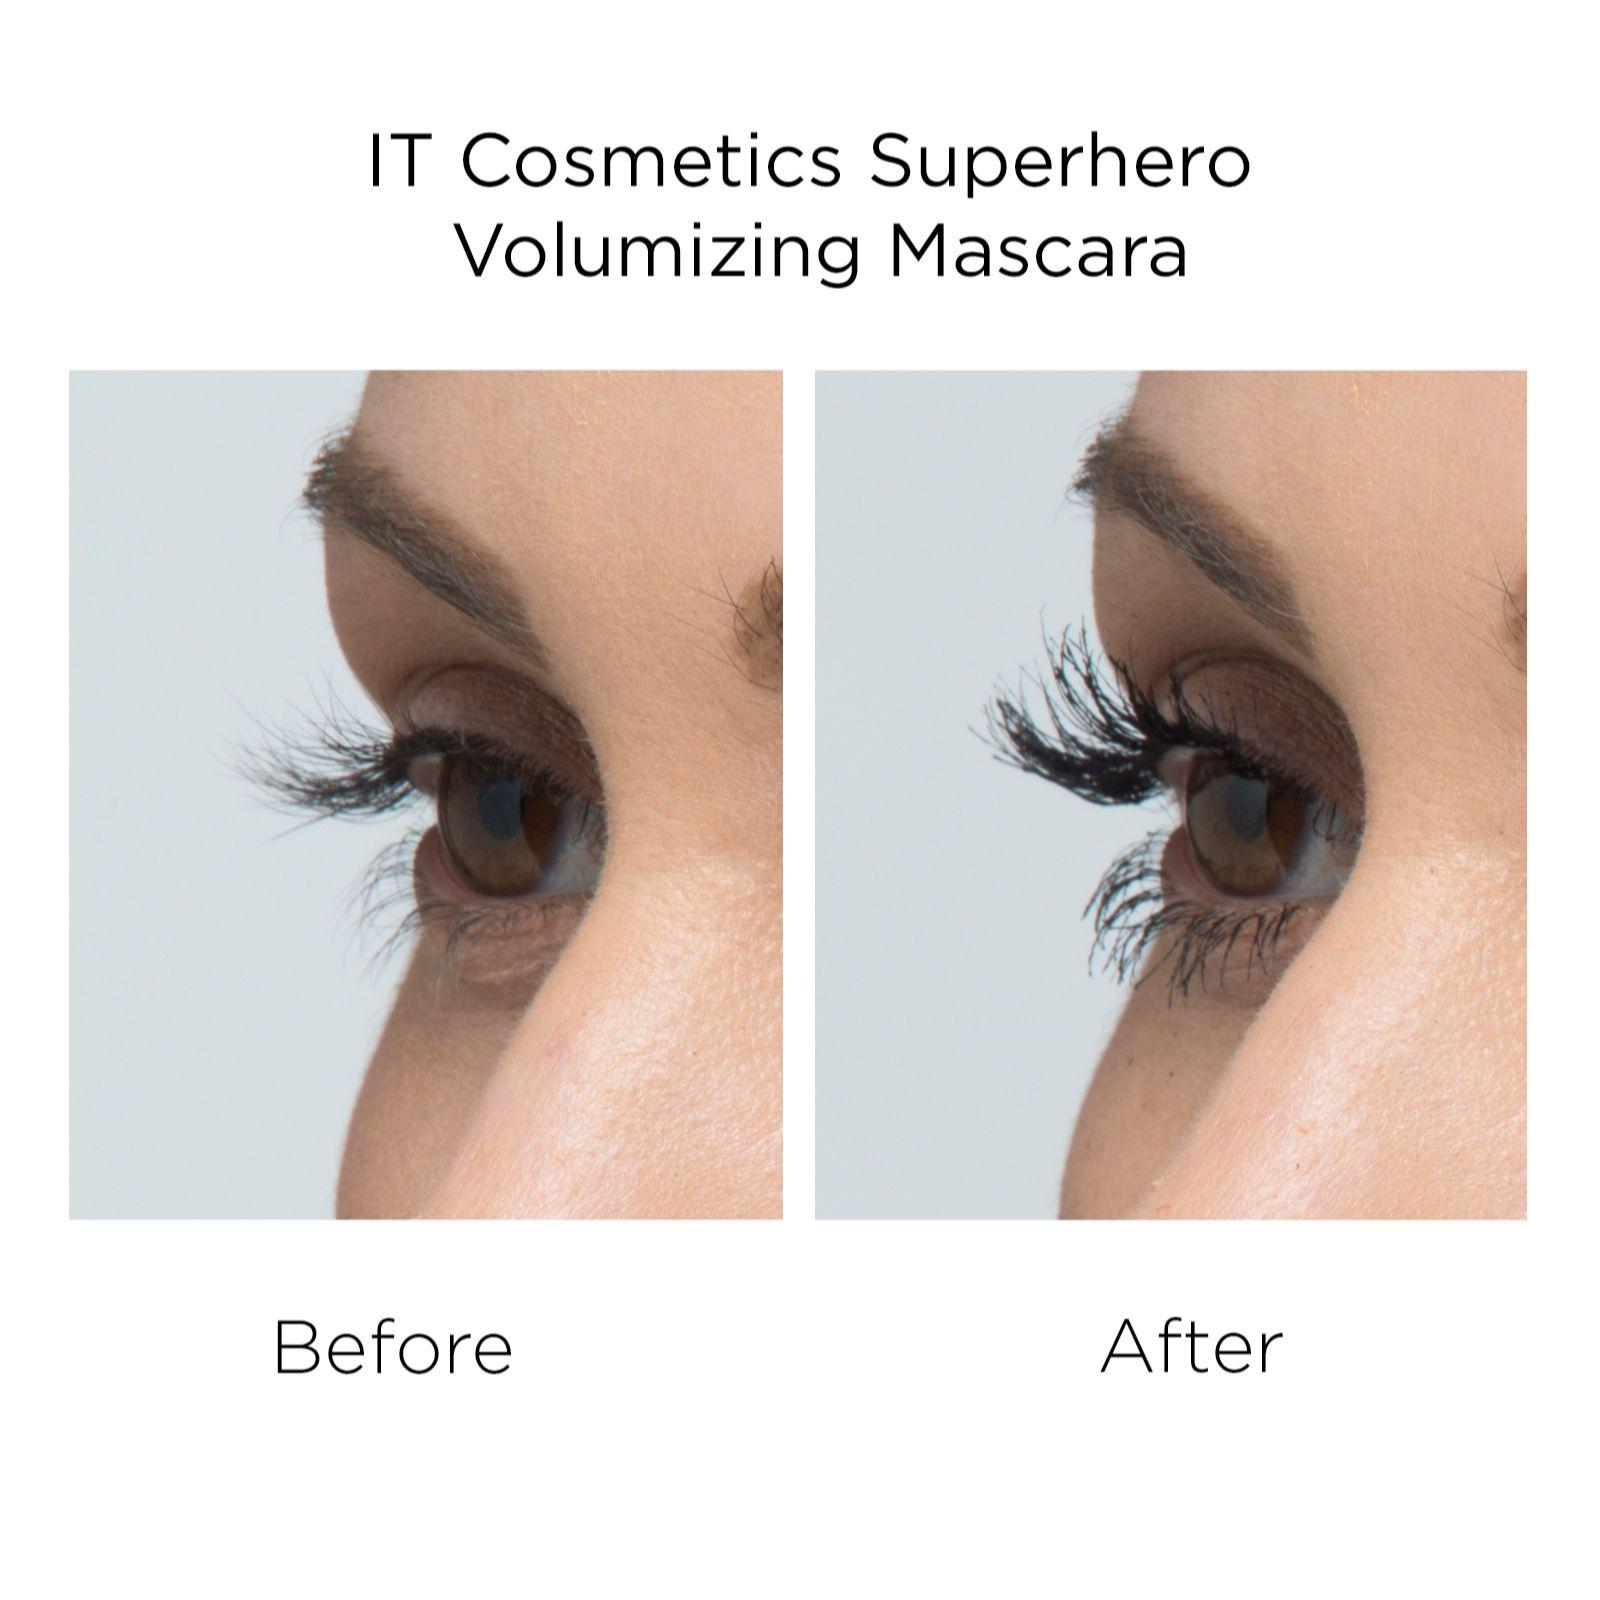 dbf8d837852 IT Cosmetics Superhero Elastic Stretch Volumizing Mascara Duo - QVC UK